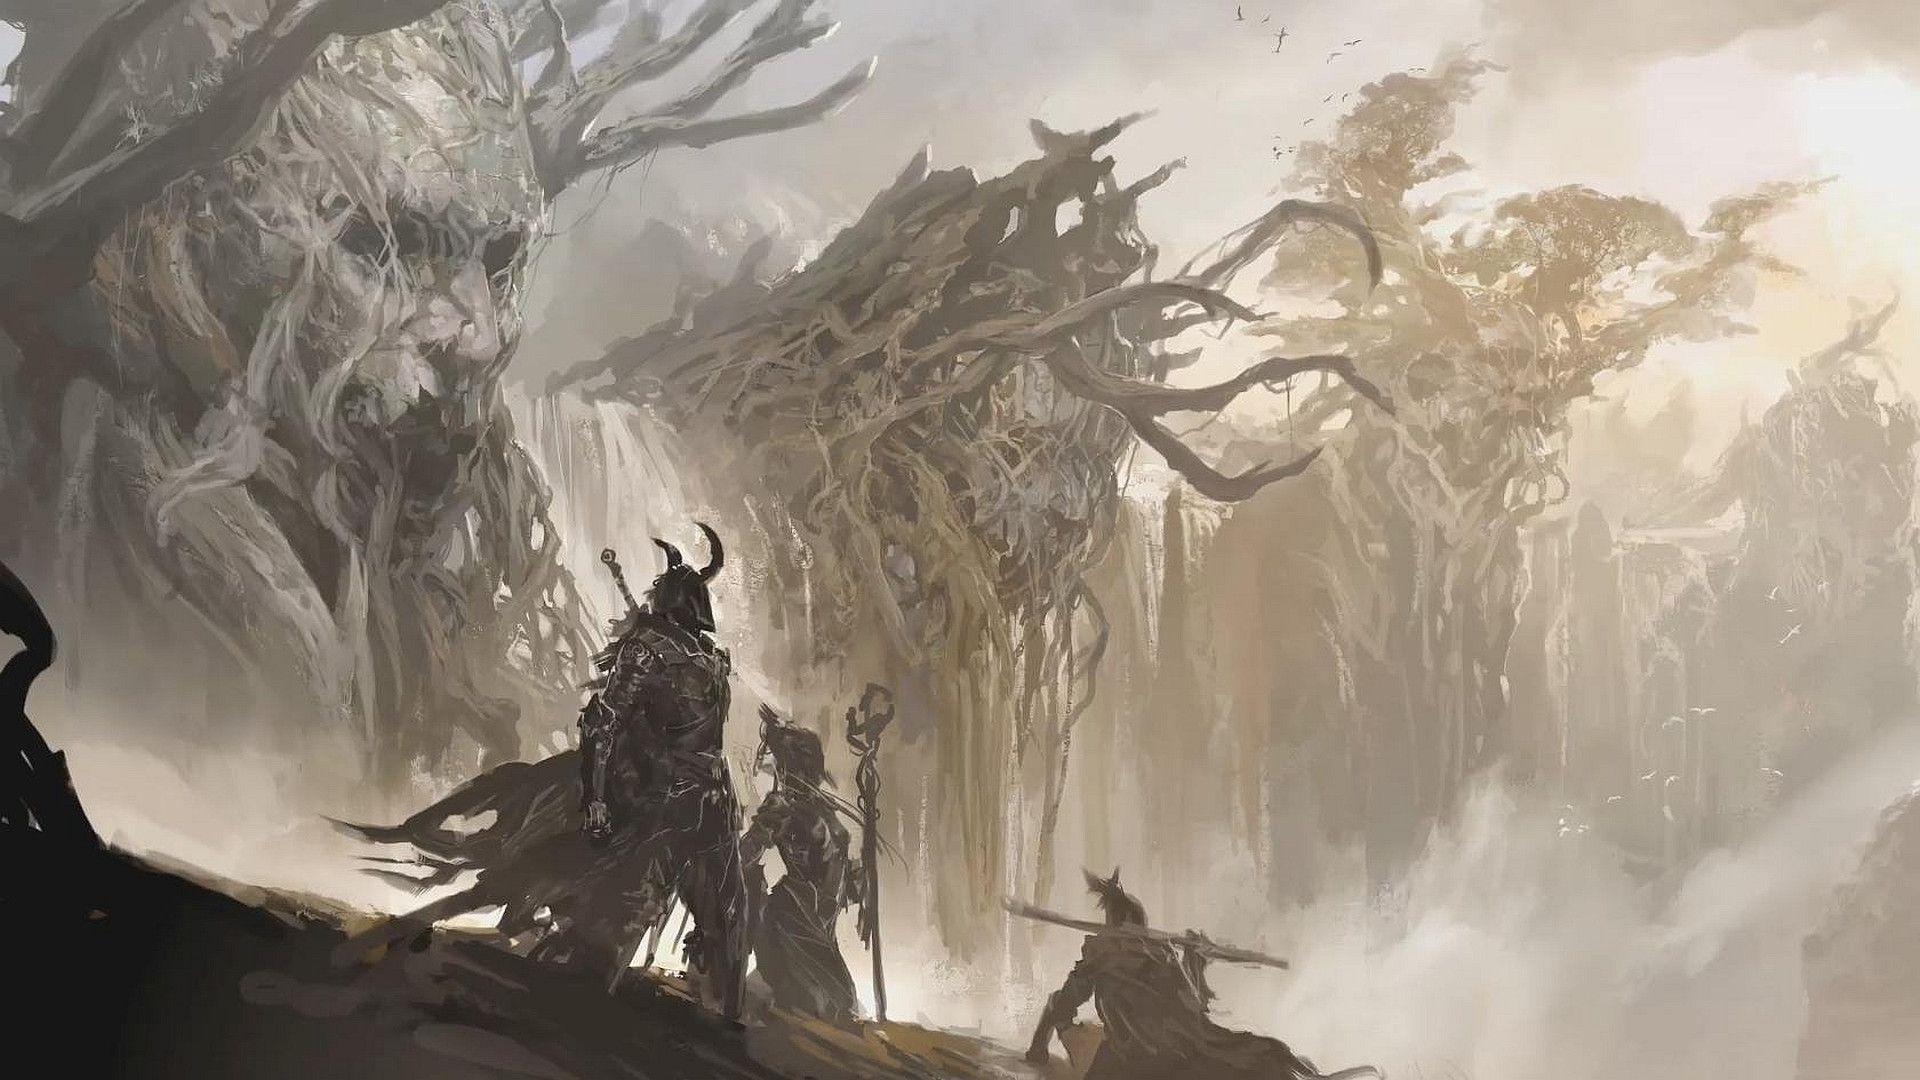 abaddon guild wars wallpaper - photo #30